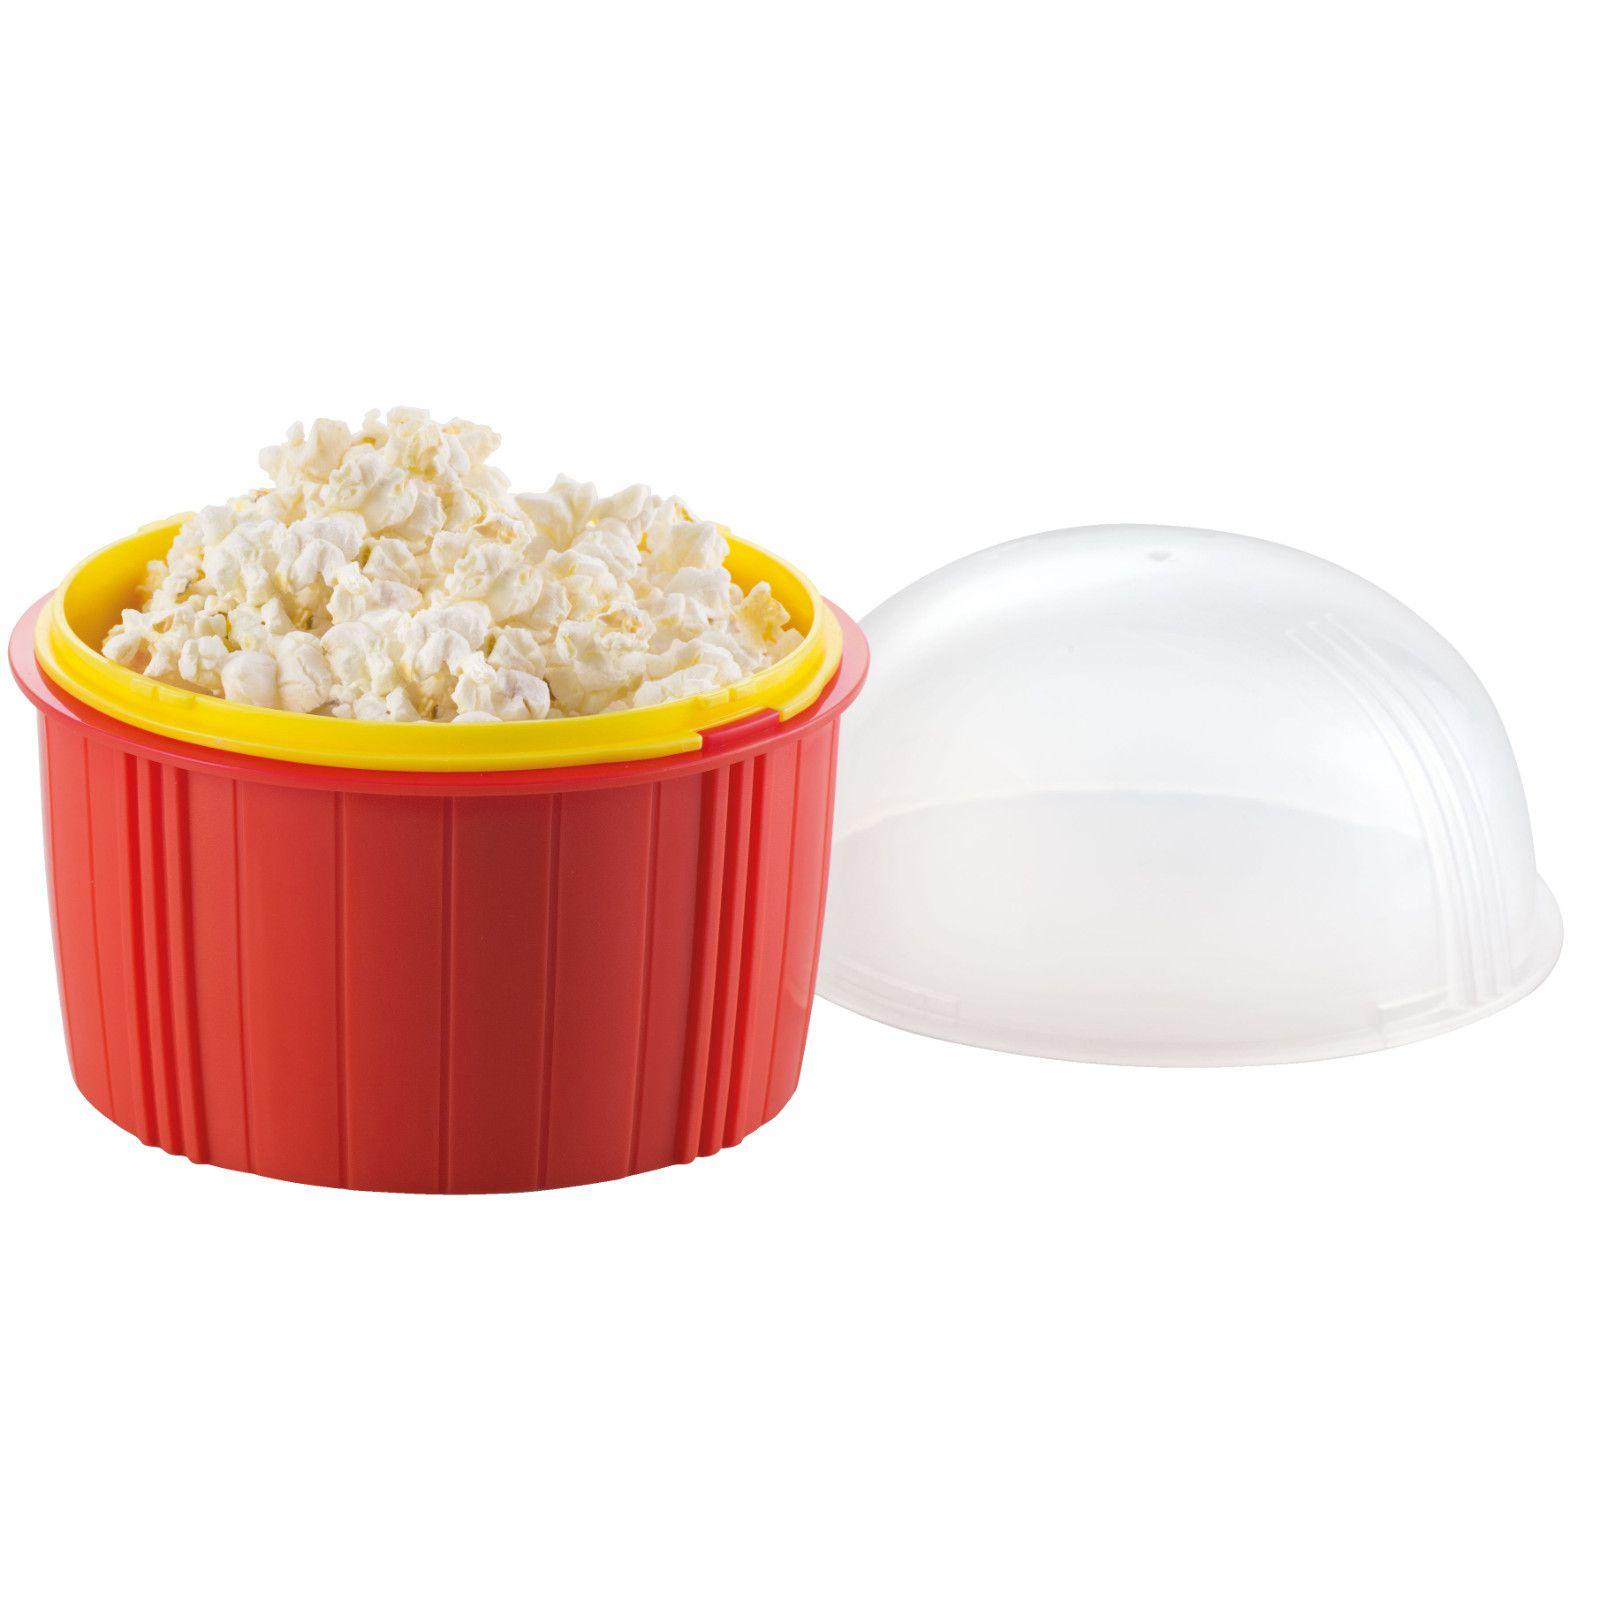 Kit 1 Pipoqueira De Microondas + 1 Ovo Fácil Cheff DTC